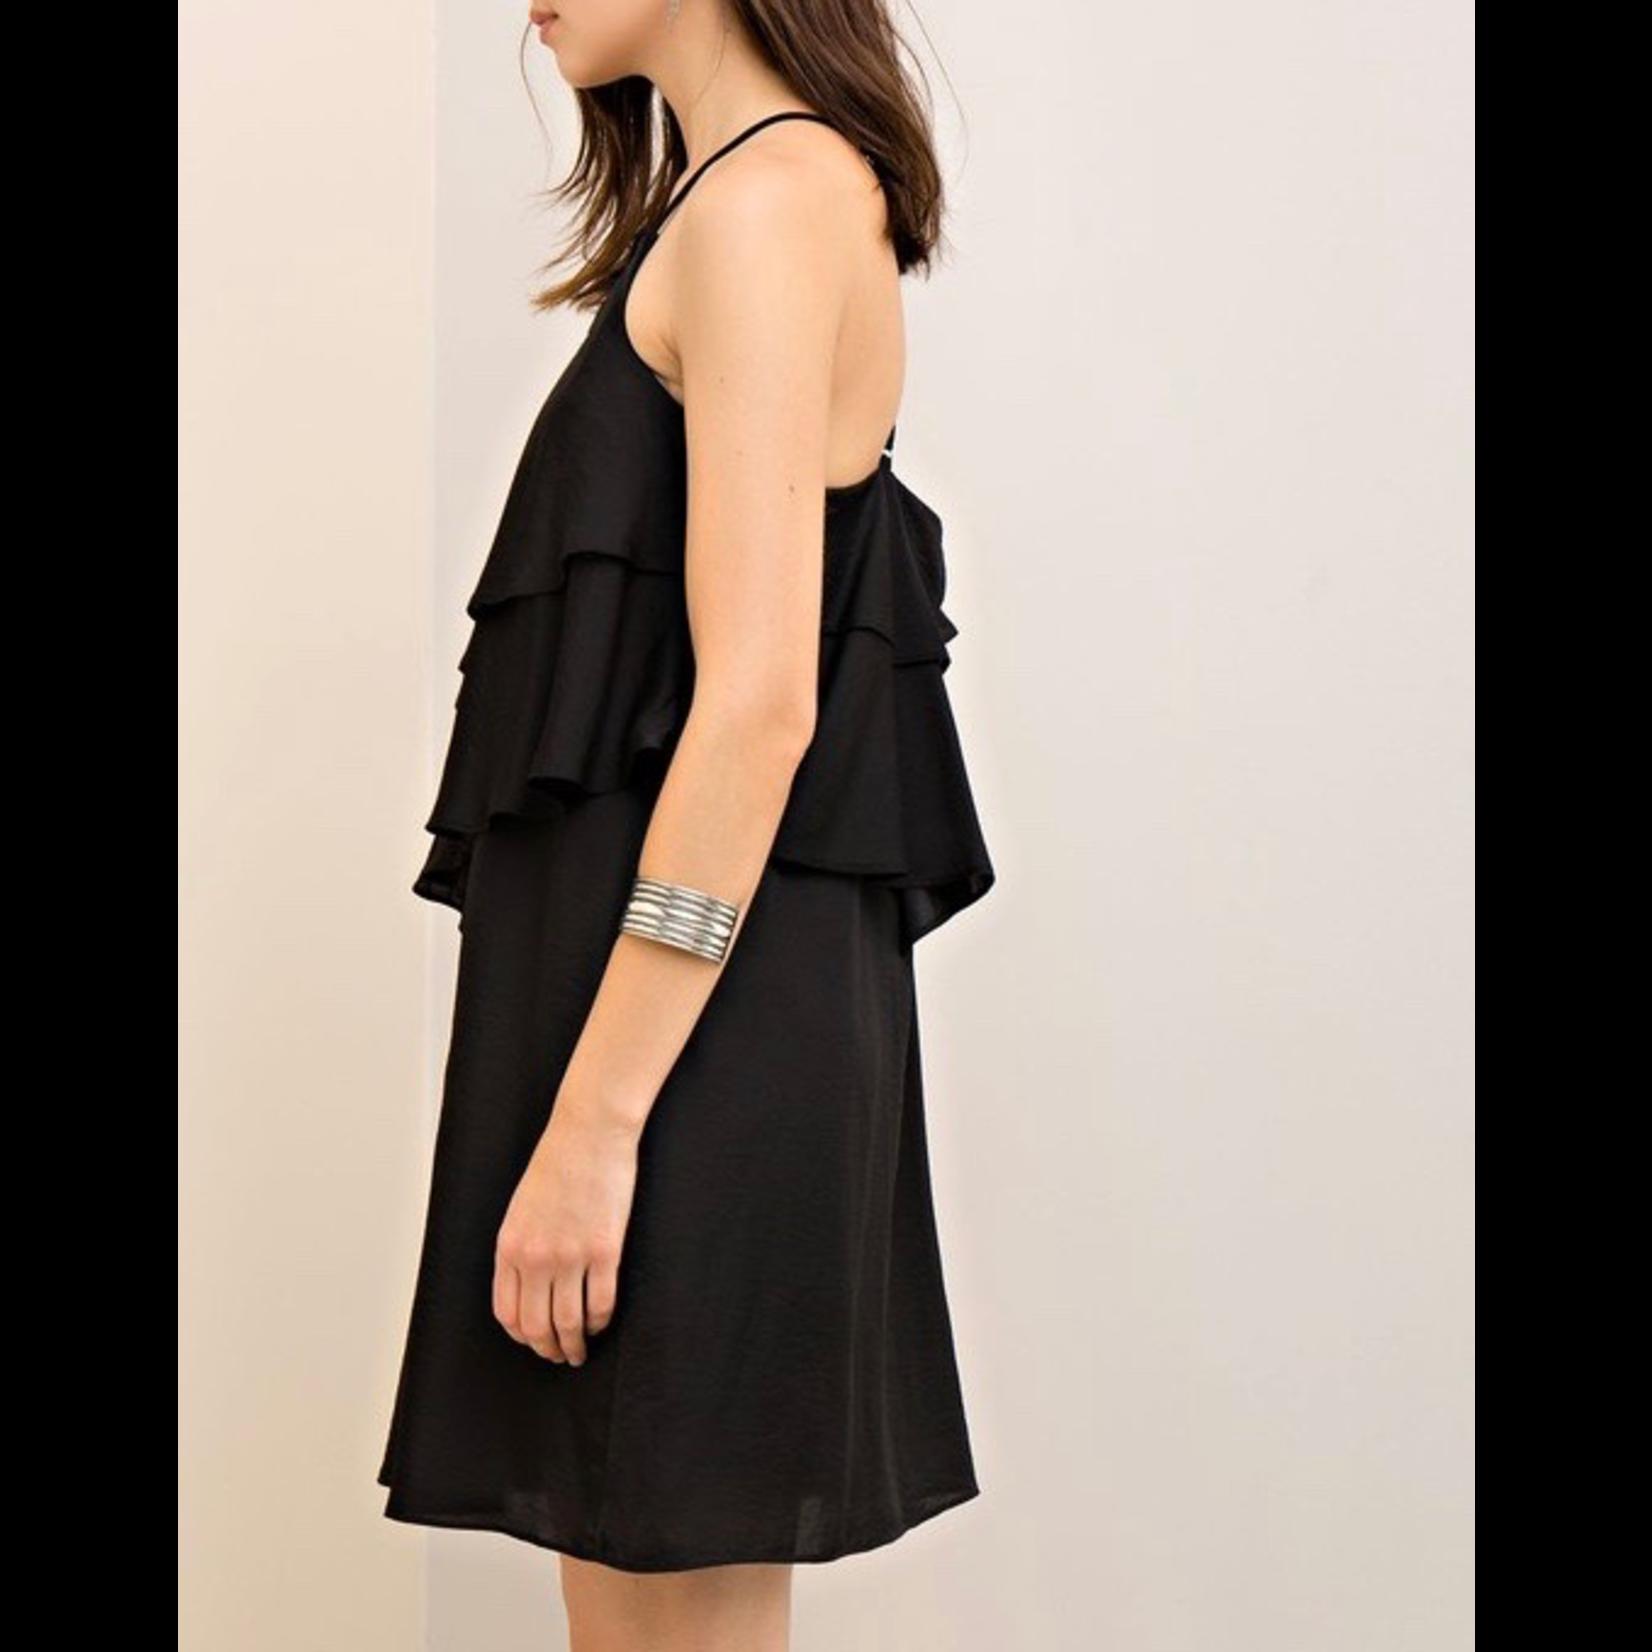 Entro Ruffle Shift Dress, sale item, Was $52